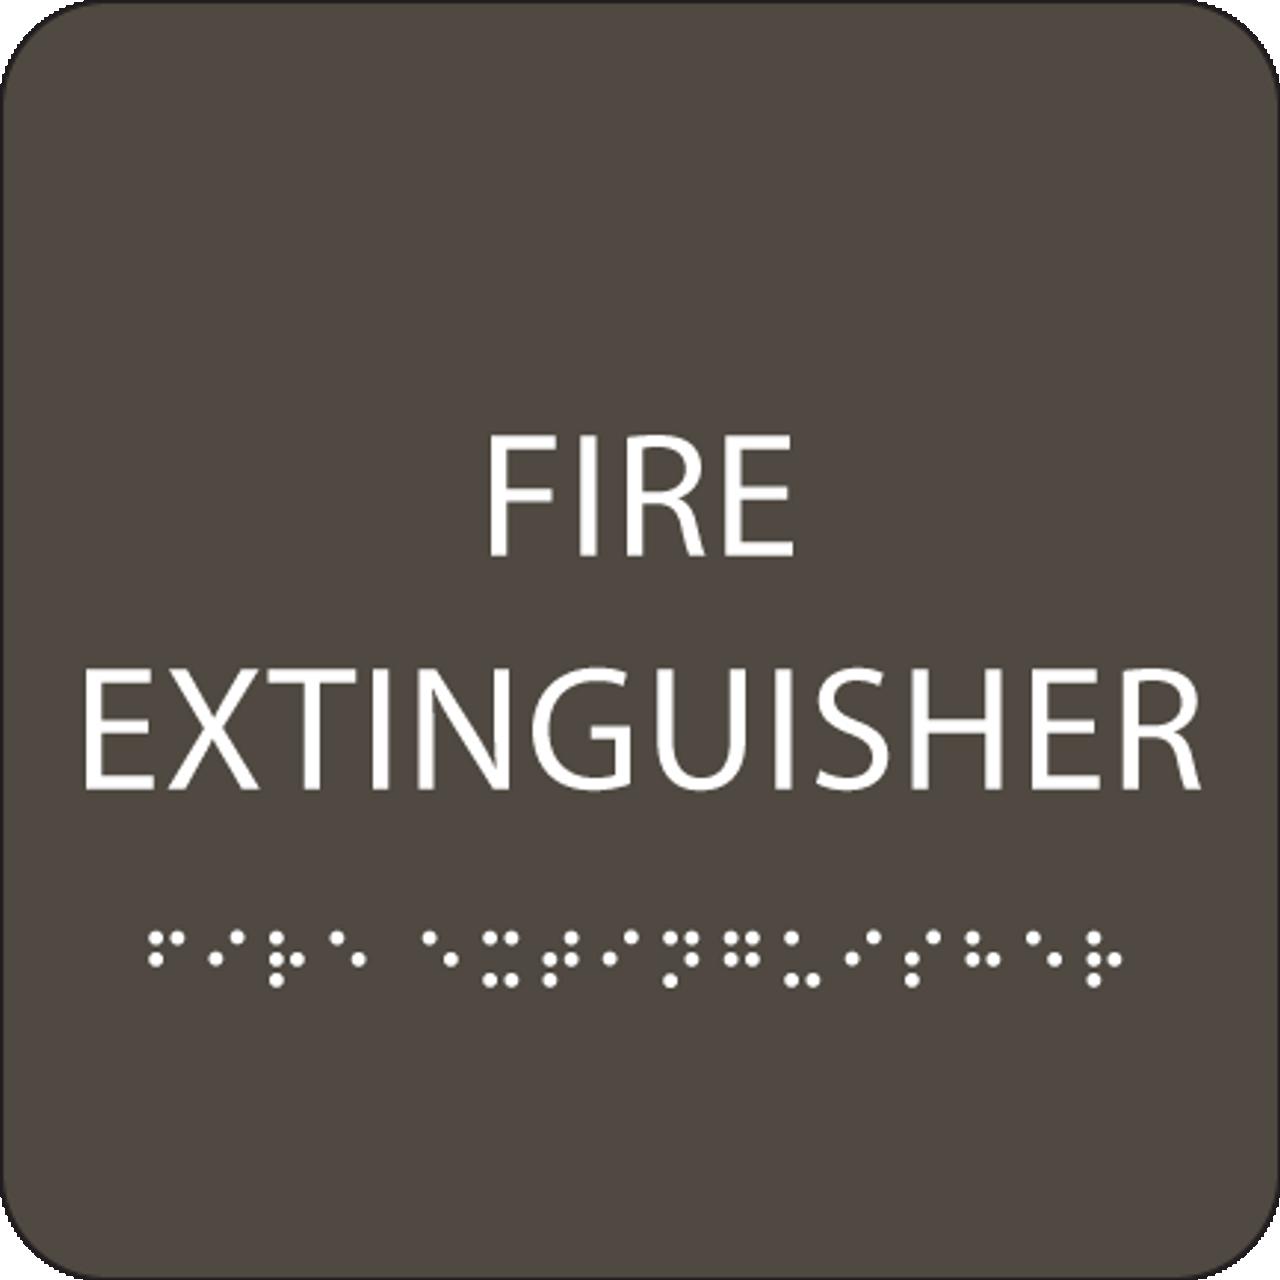 Olive Fire Extinguisher ADA Sign